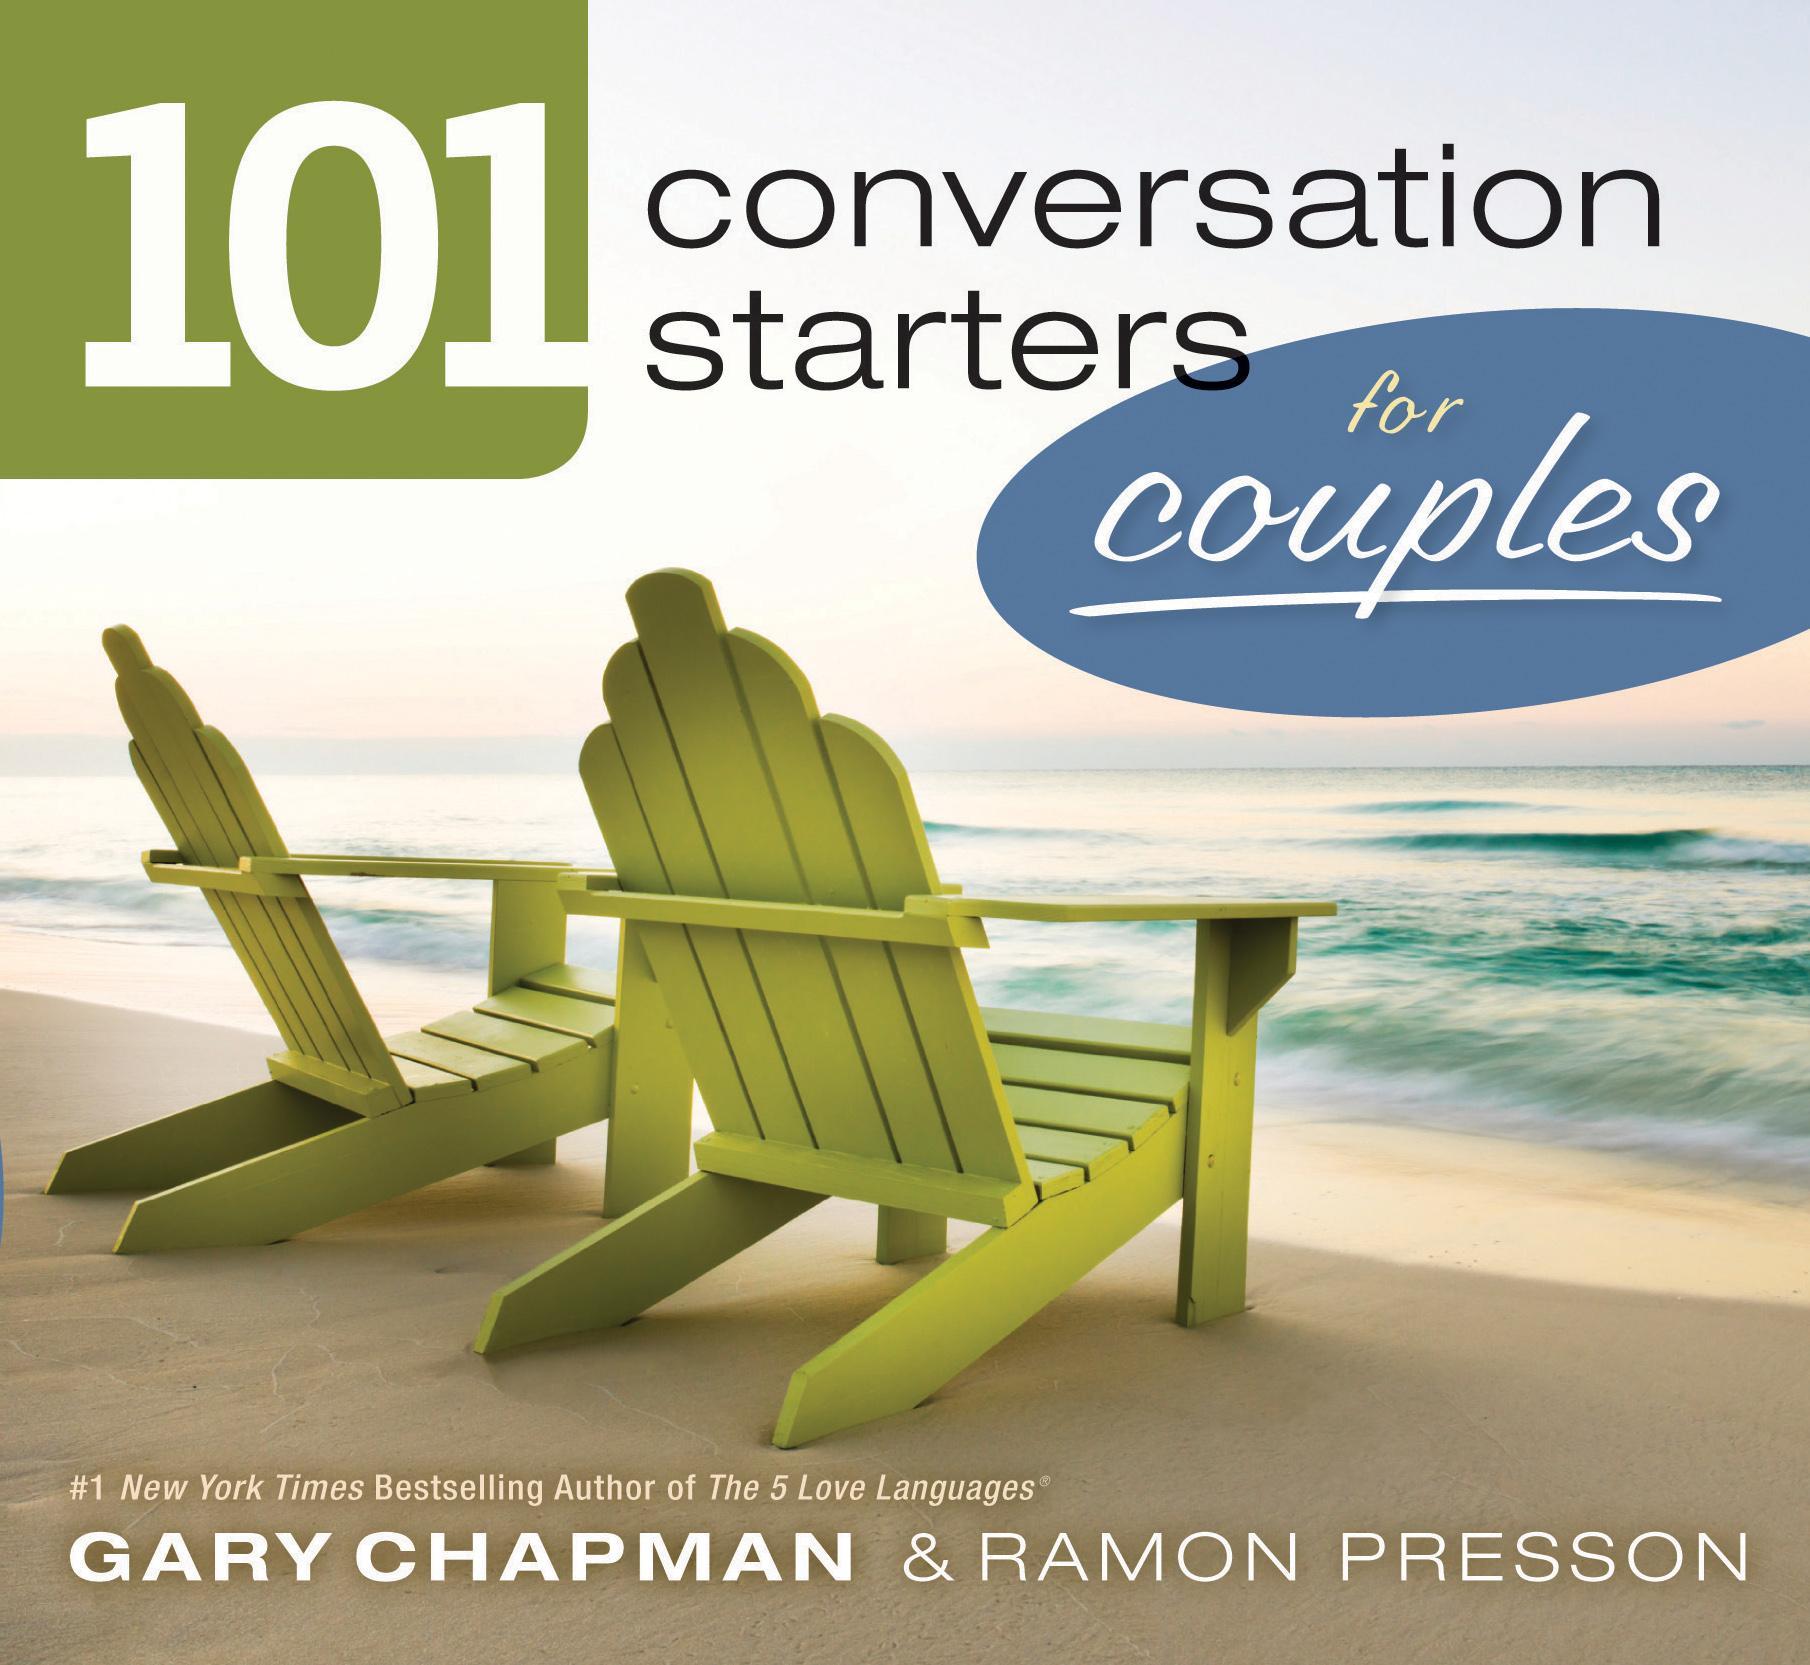 101 Conversation Starters